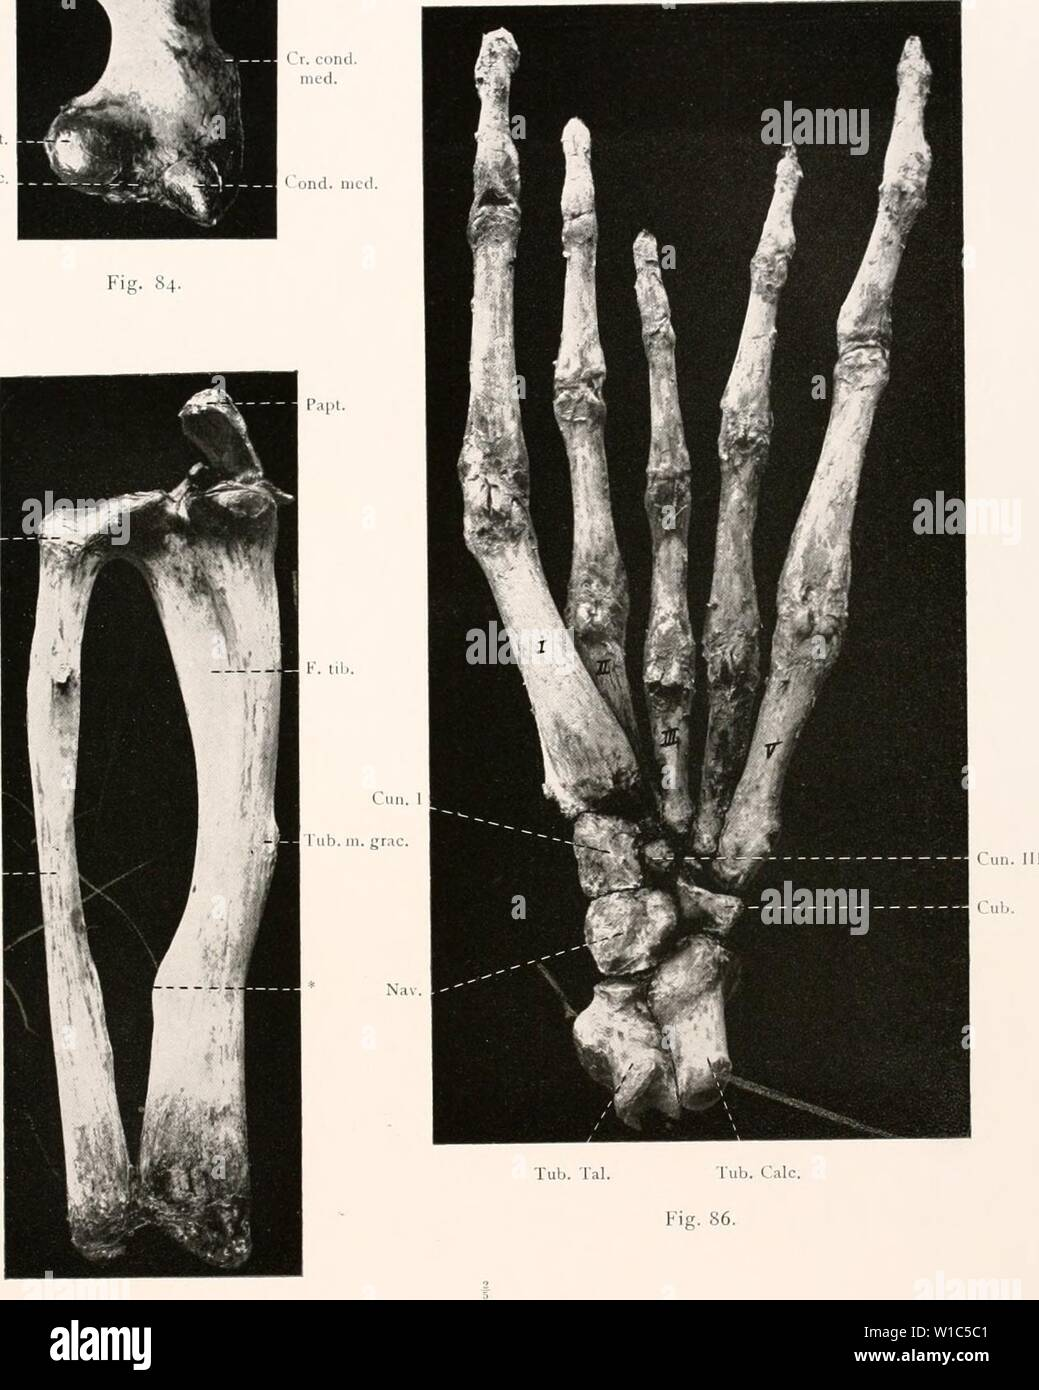 Archive image from page 530 of Deutsche Südpolar-Expedition, 1901-1903, im Auftrage. Deutsche Südpolar-Expedition, 1901-1903, im Auftrage des Reichsamtes des Innern . deutschesdpola16deut Year: 1921  Deutsche Südpolar-Expedition l'.>01â3. Band XVI Tafel LI. Tr. maj. j â¢V p J . a  m â¢.fl il. i und. lat. -Â« 1 K'. V F. interc. â â - i.>->; H 1' Cap. fem, Cap. fil Kib.    Fig. 85. Leptonychotes (erwachsen 1 Stock Photo